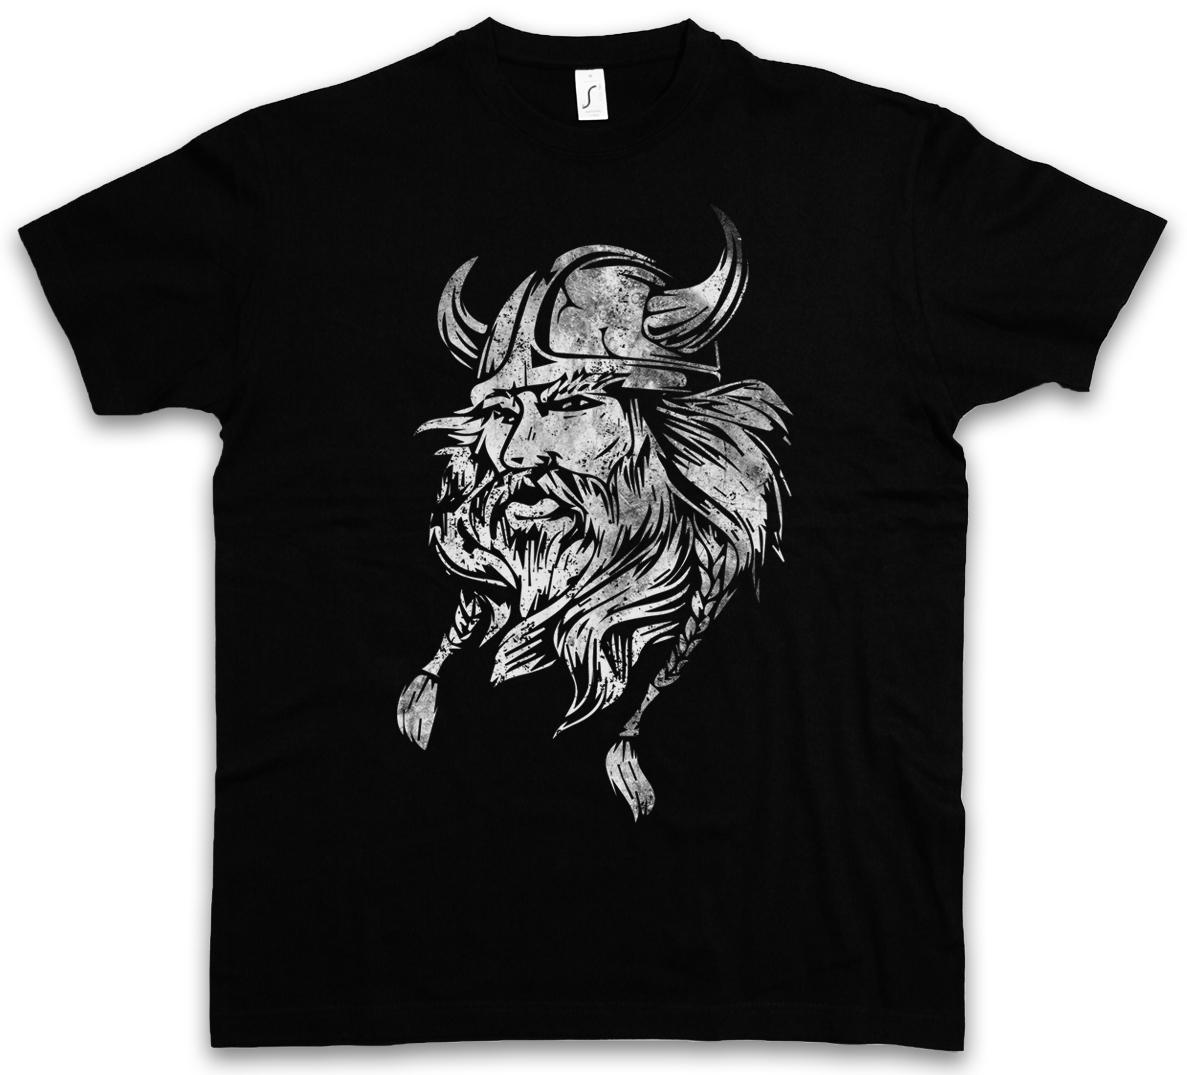 Odin Face Runes Valhalla T Shirt Viking Norse Gothic Pagan Tee Present Gift Idea